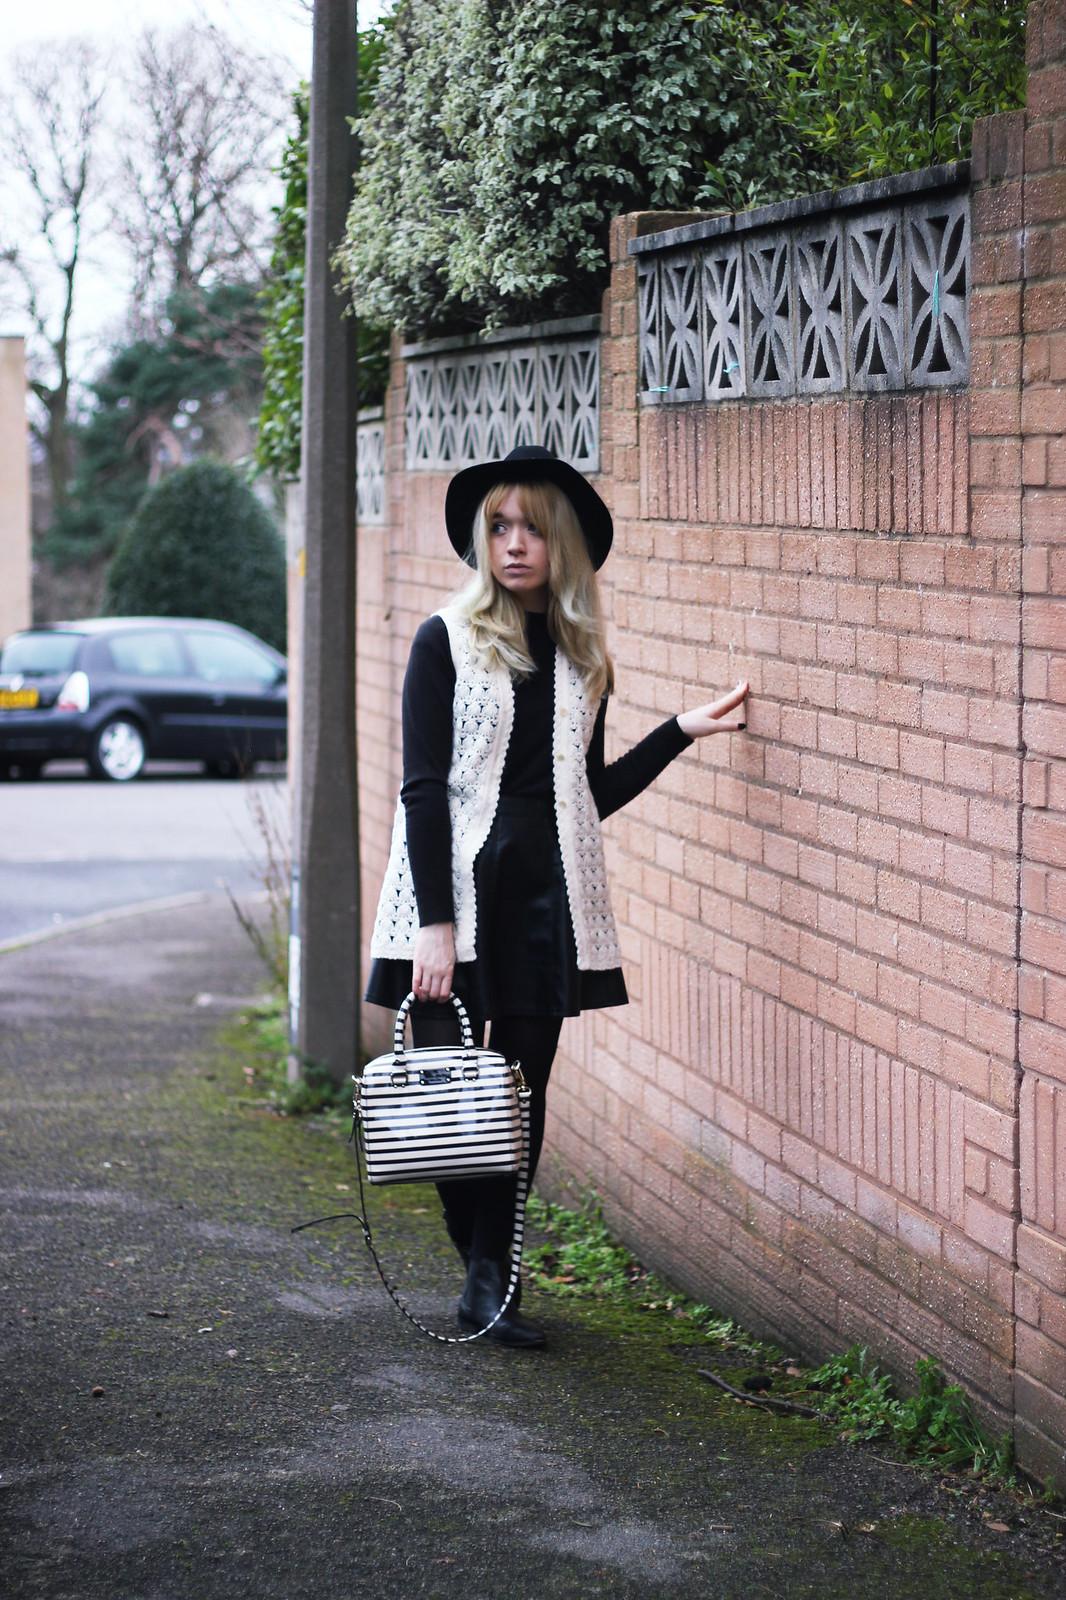 5-crochet-Waistcoat-outfit, fashion-blogger-style, boho, mod